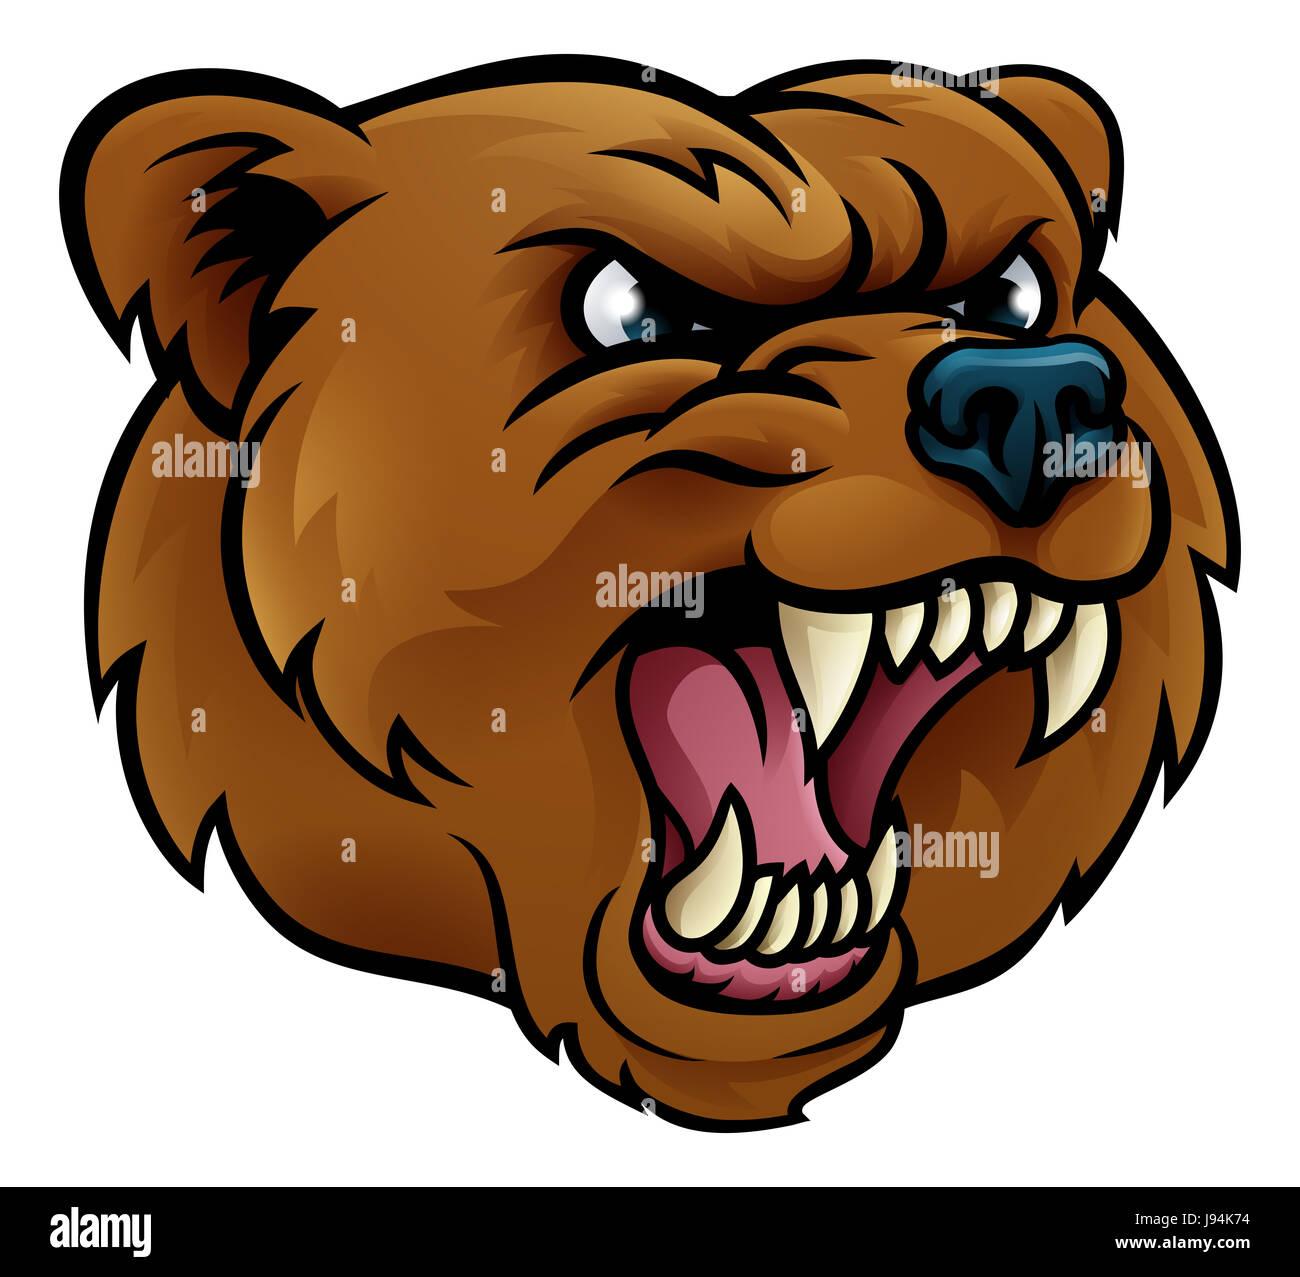 bear grizzly angry sports mascot cartoon character face stock photo rh alamy com cartoon bear face images cartoon bear face images